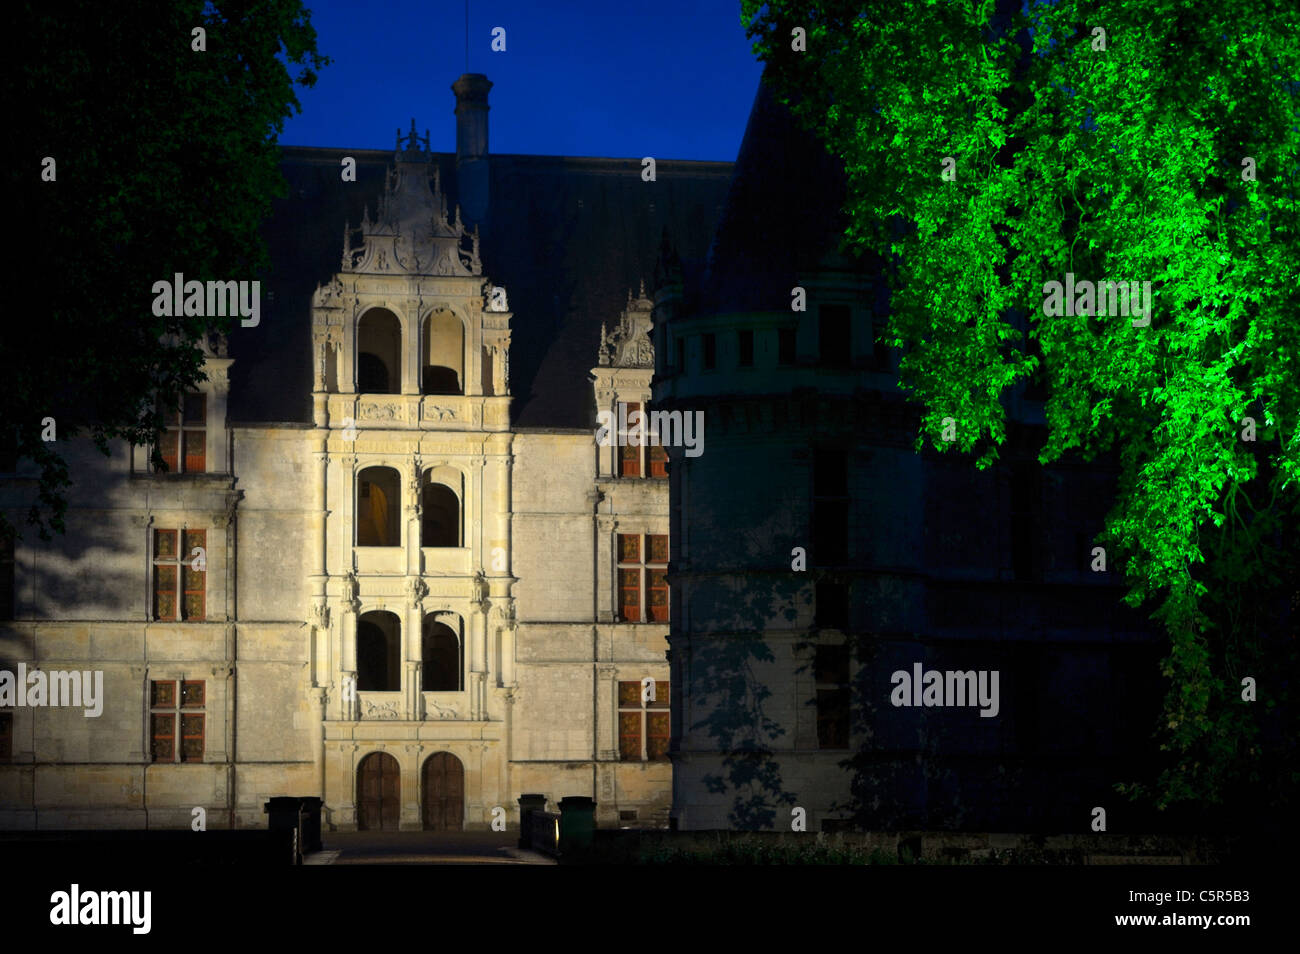 Chateau Azay Le Rideau Illuminated At Night France Fr Stock Photo